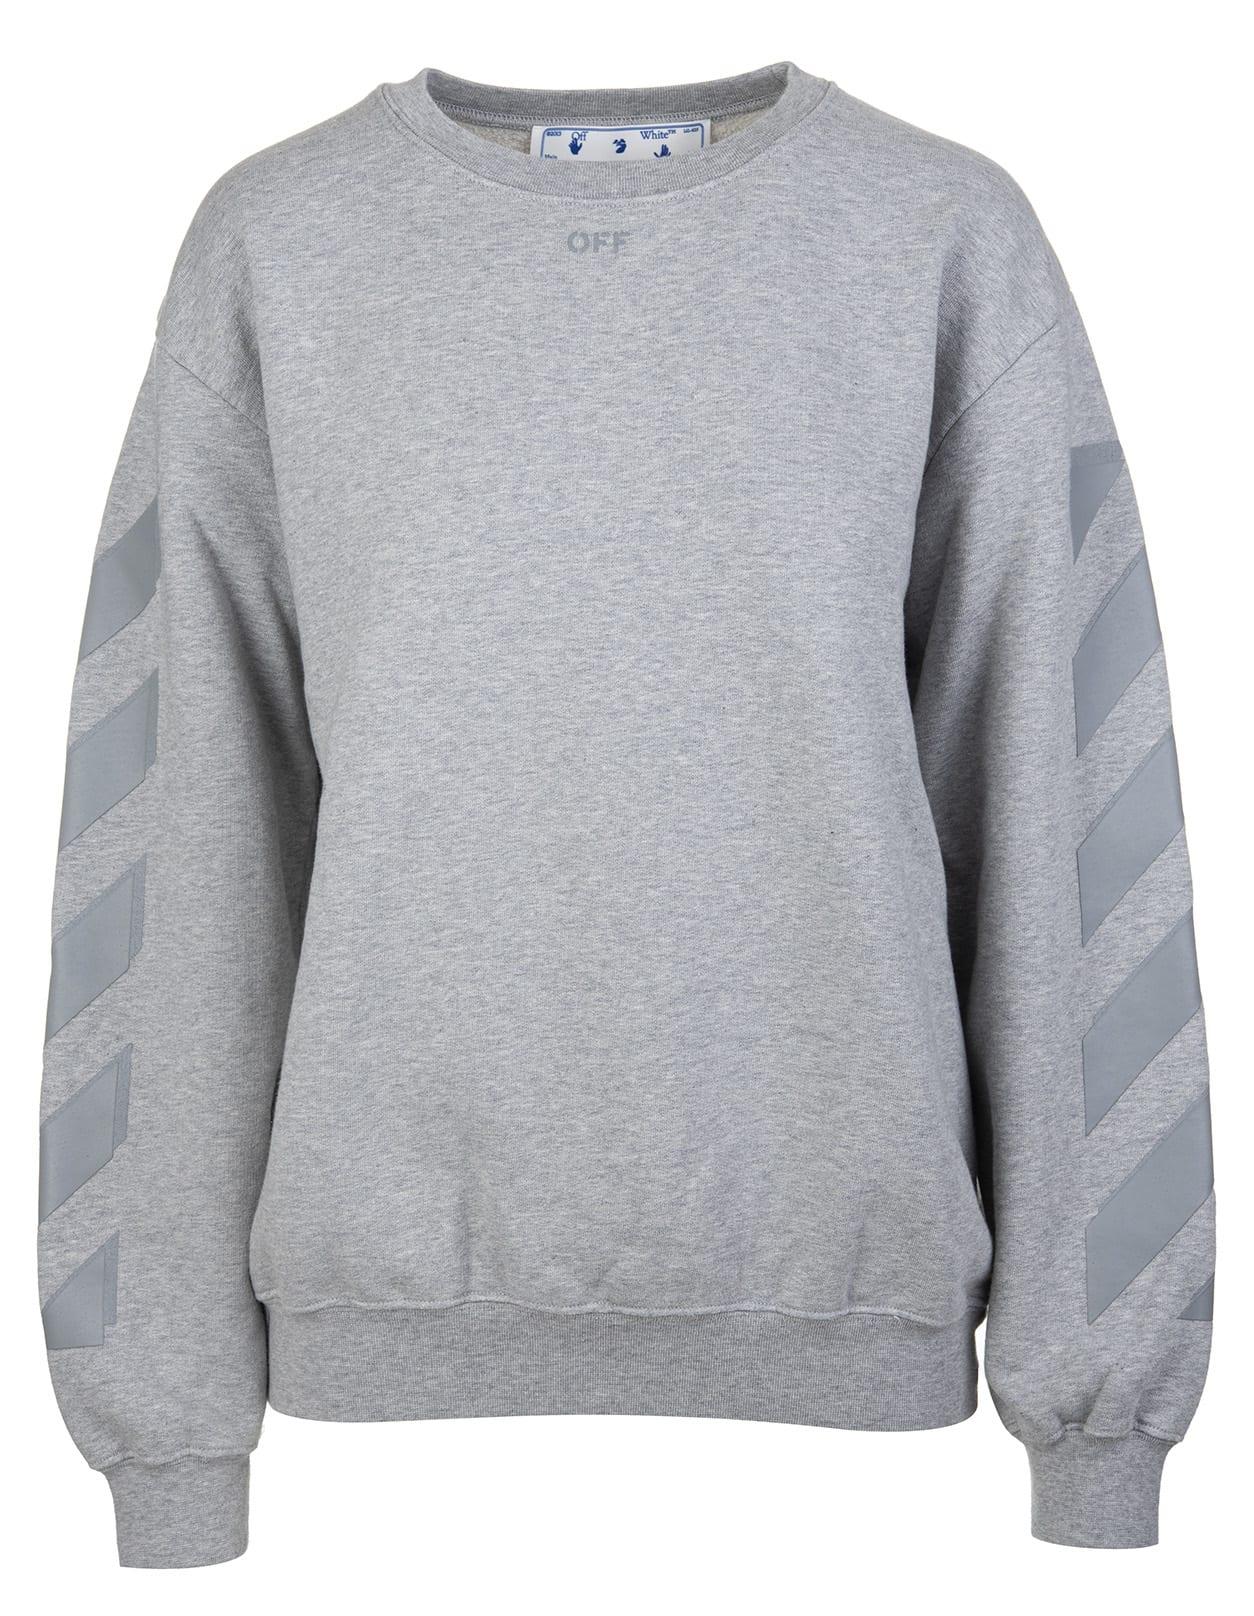 Off-White Woman Grey Arrow Sweatshirt